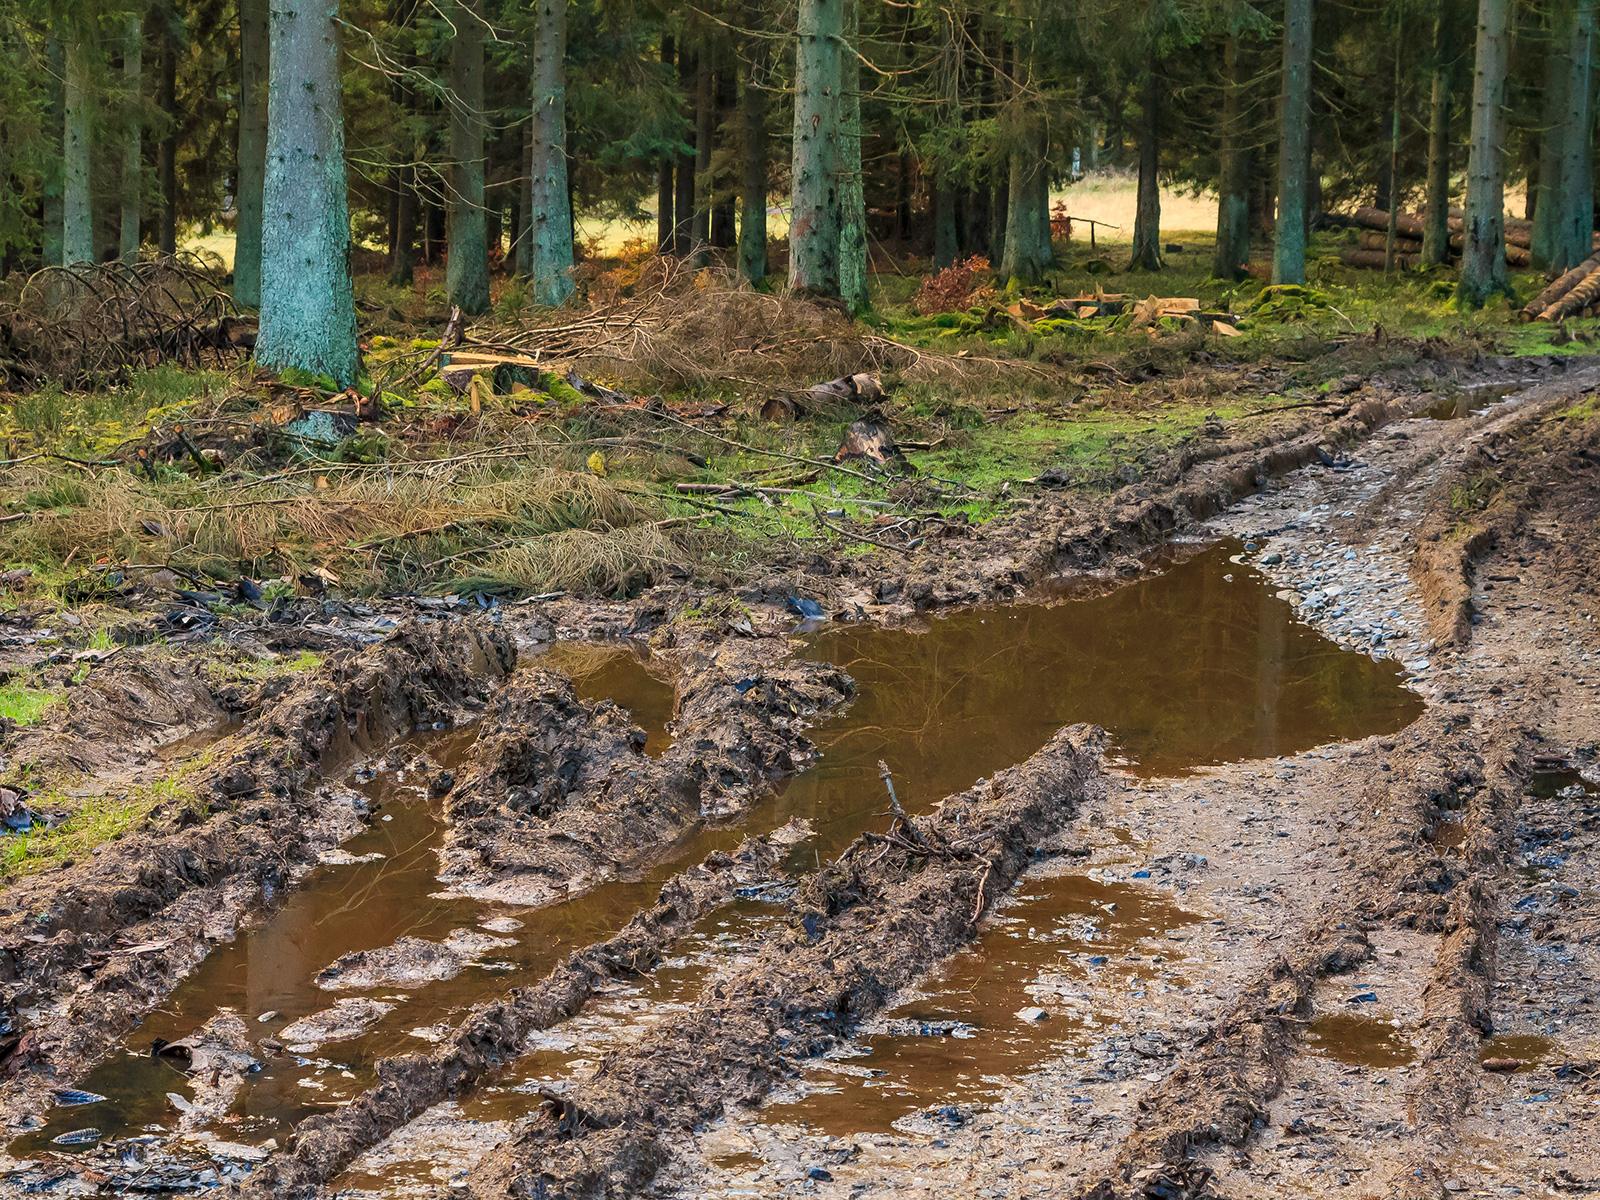 tiefe Bodengleise neben dem Forstweg